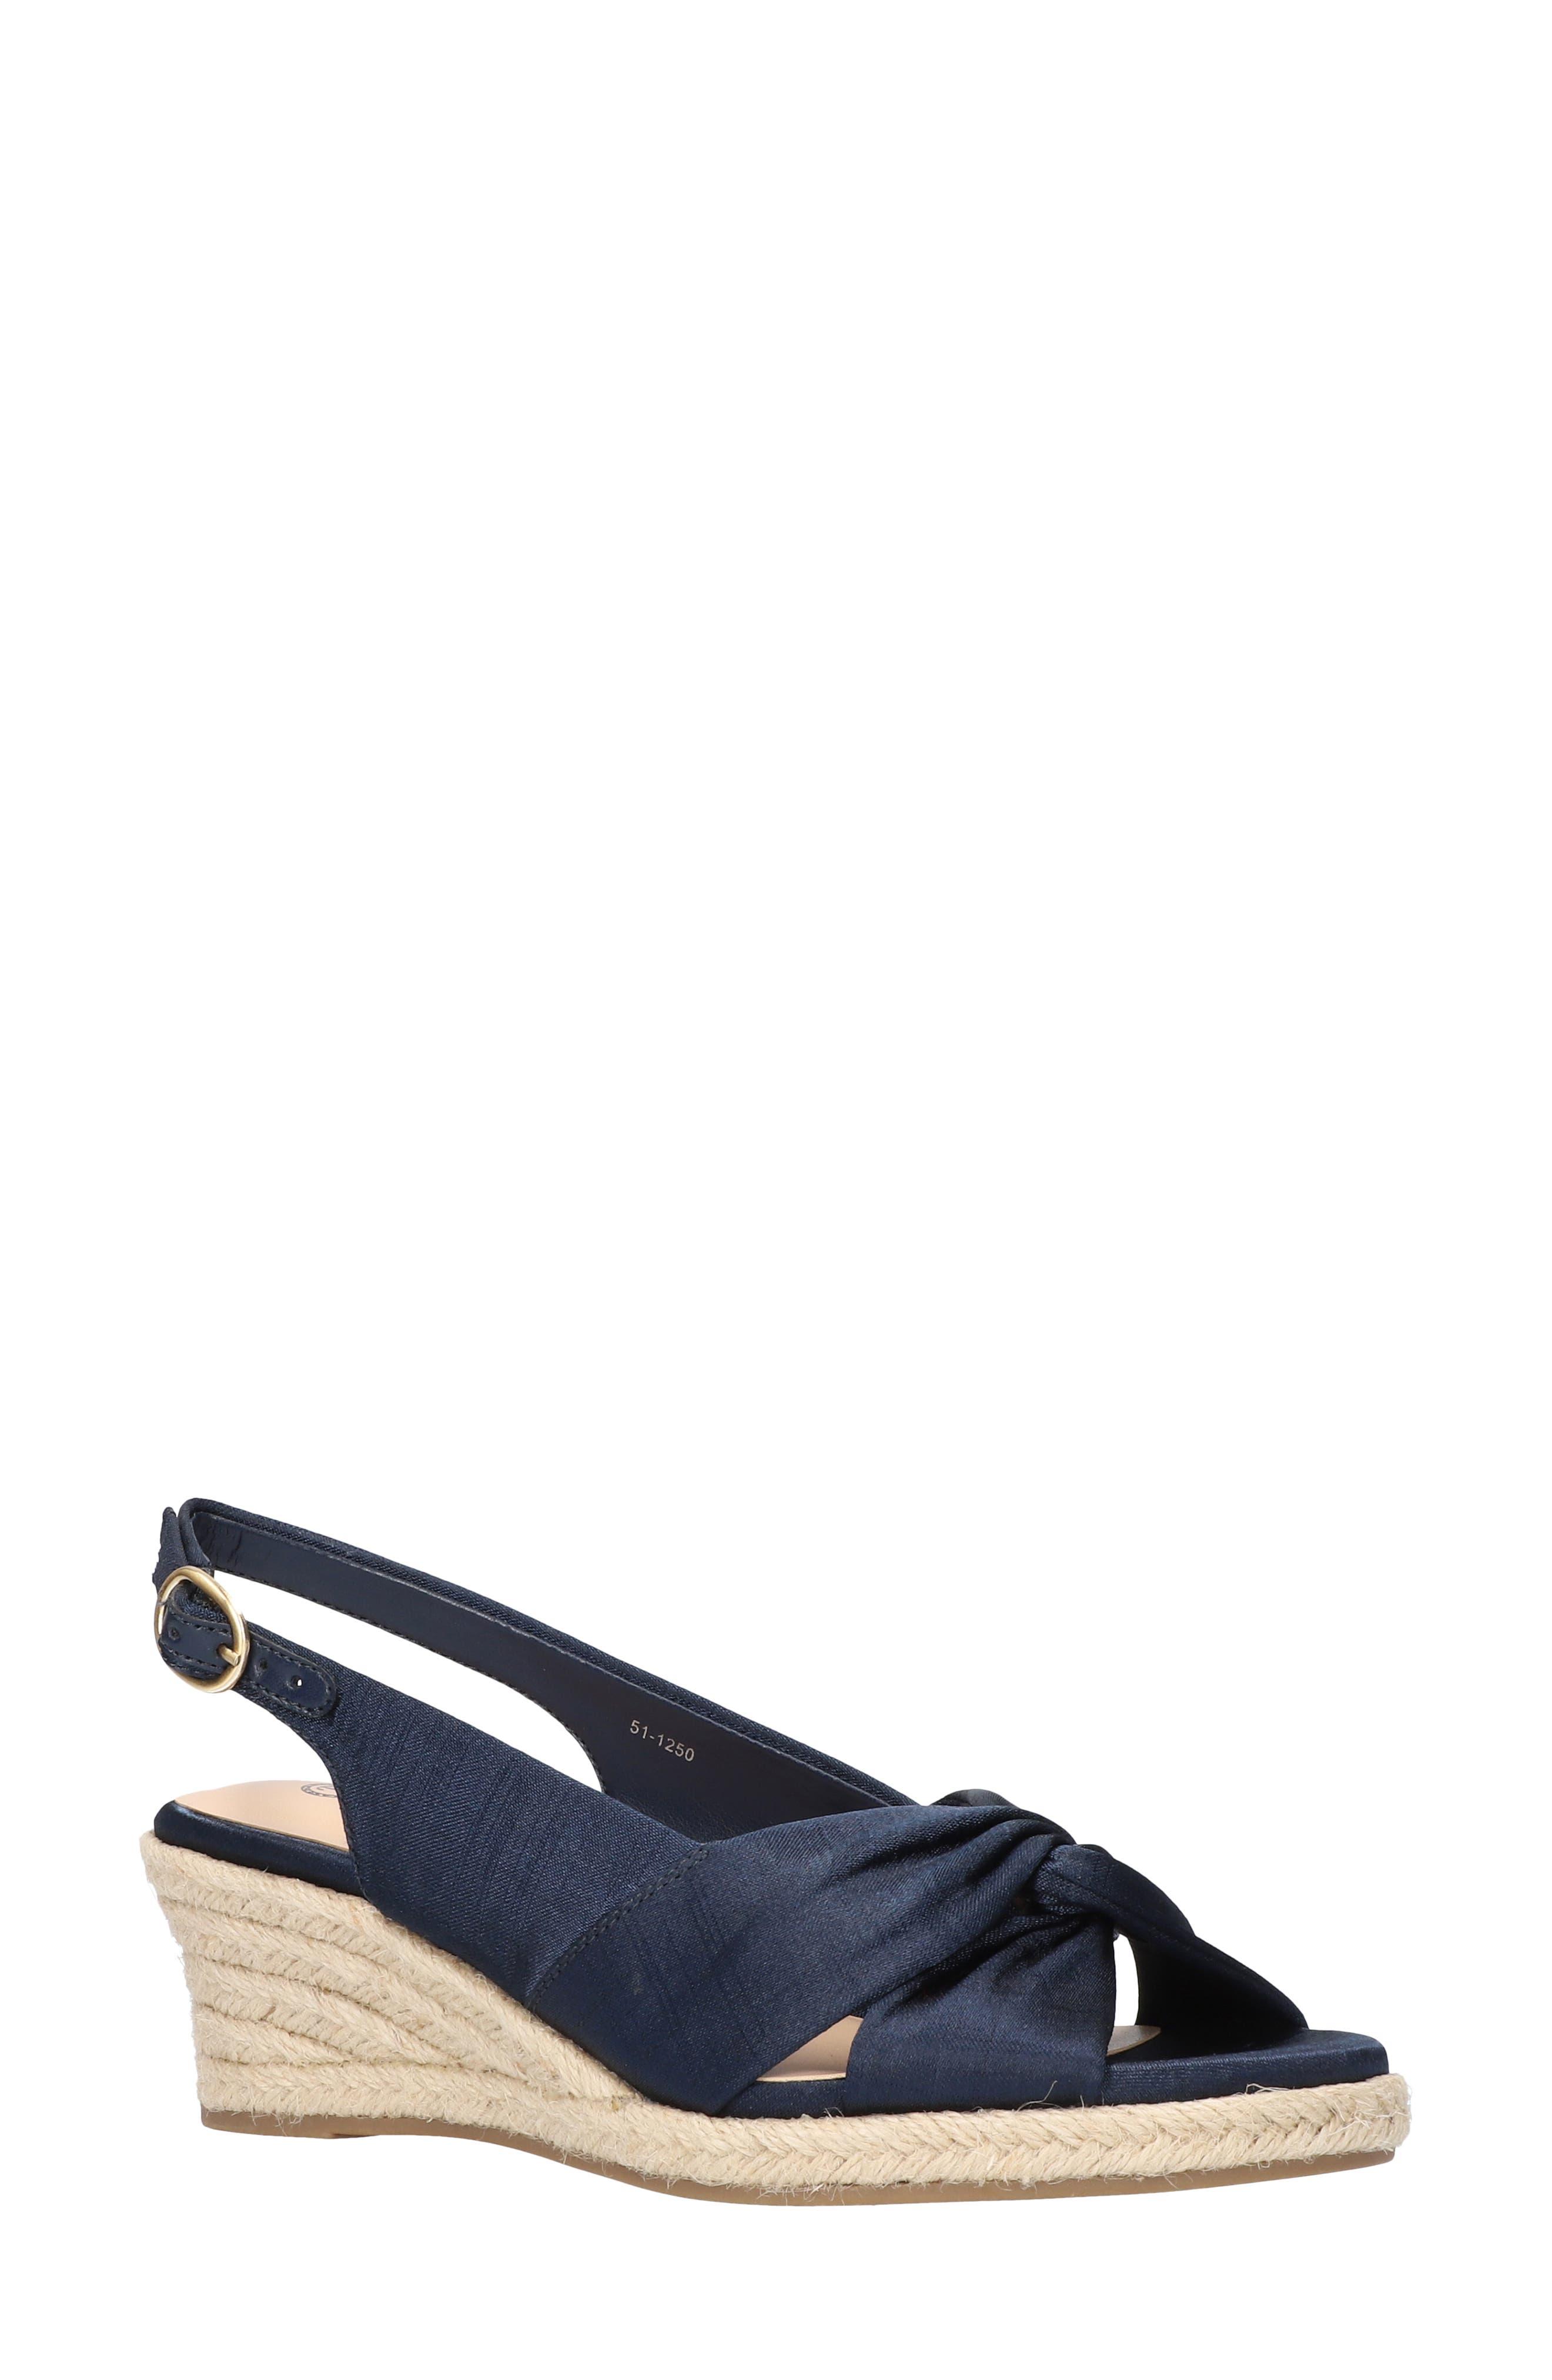 Kimora Espadrille Wedge Sandal